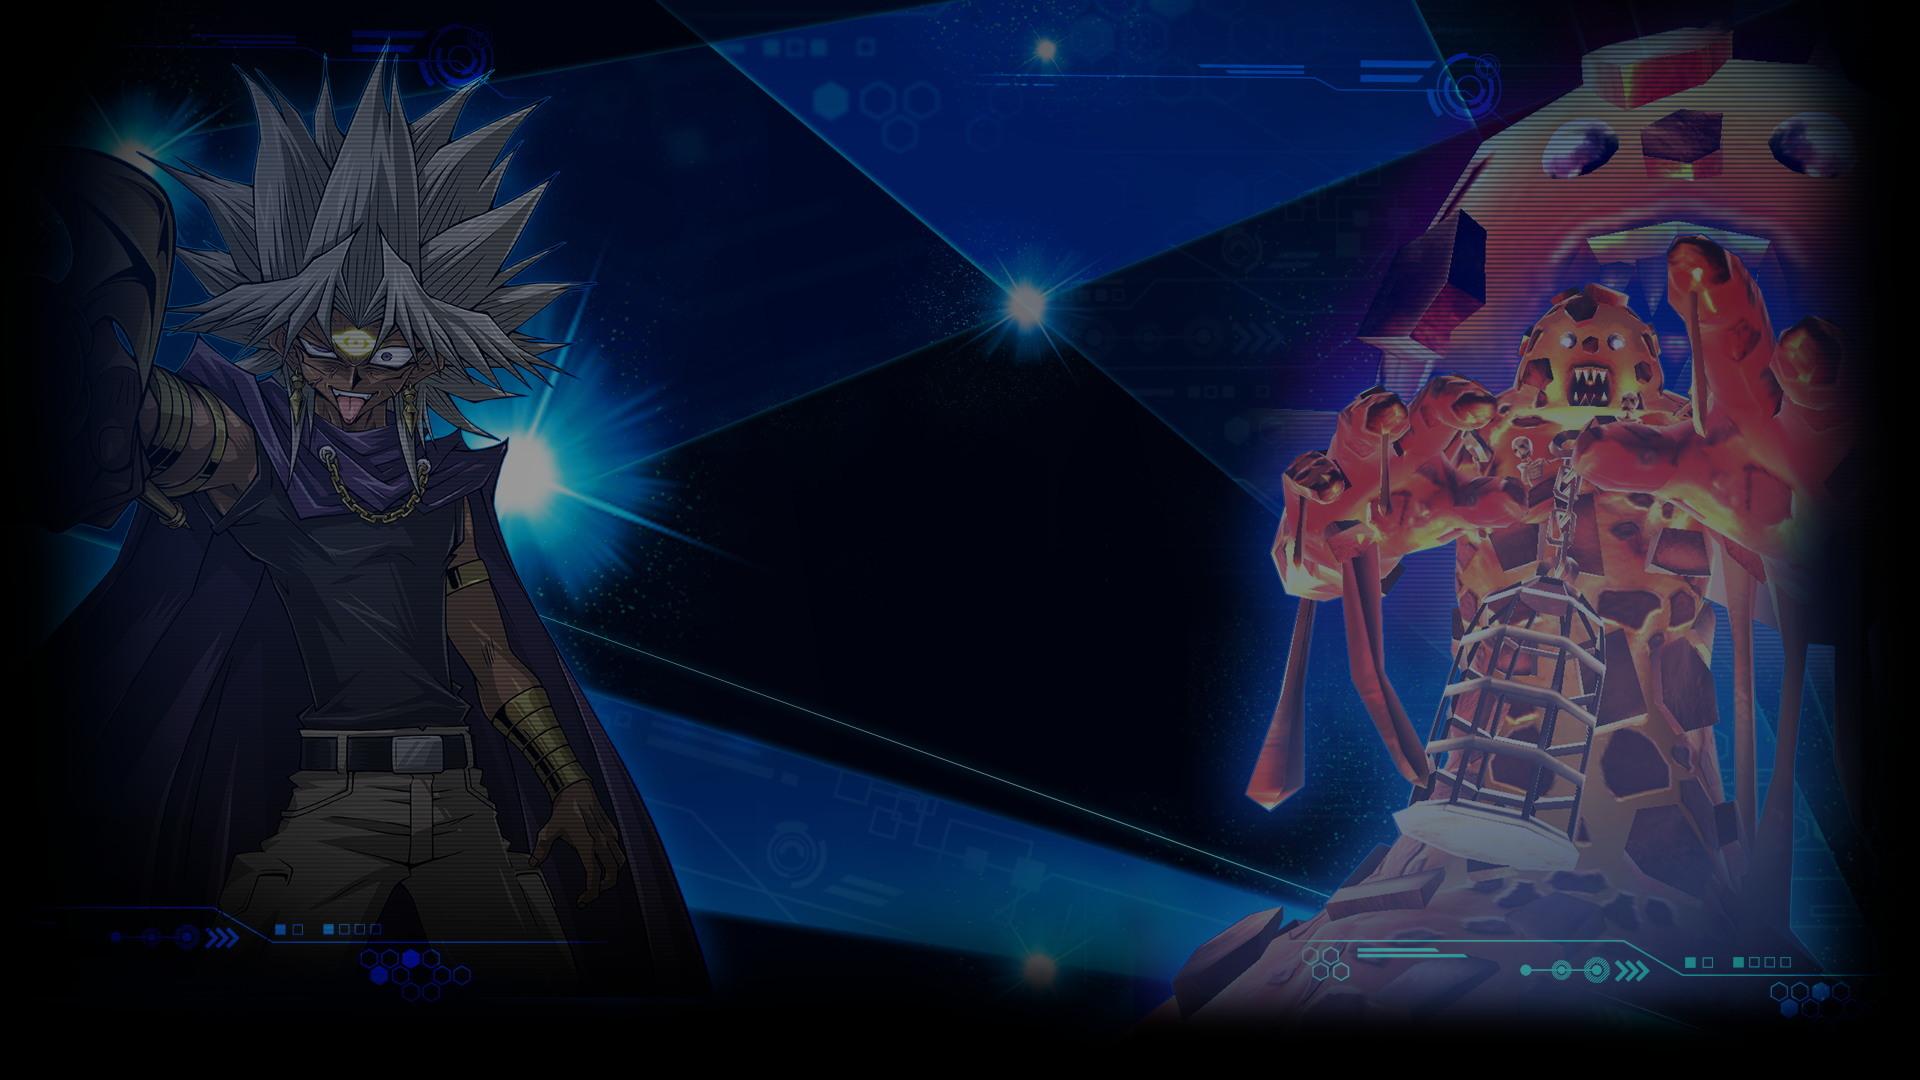 Yu Gi Oh Duel Links Wallpaper 003 Yami Marik Lava Golem